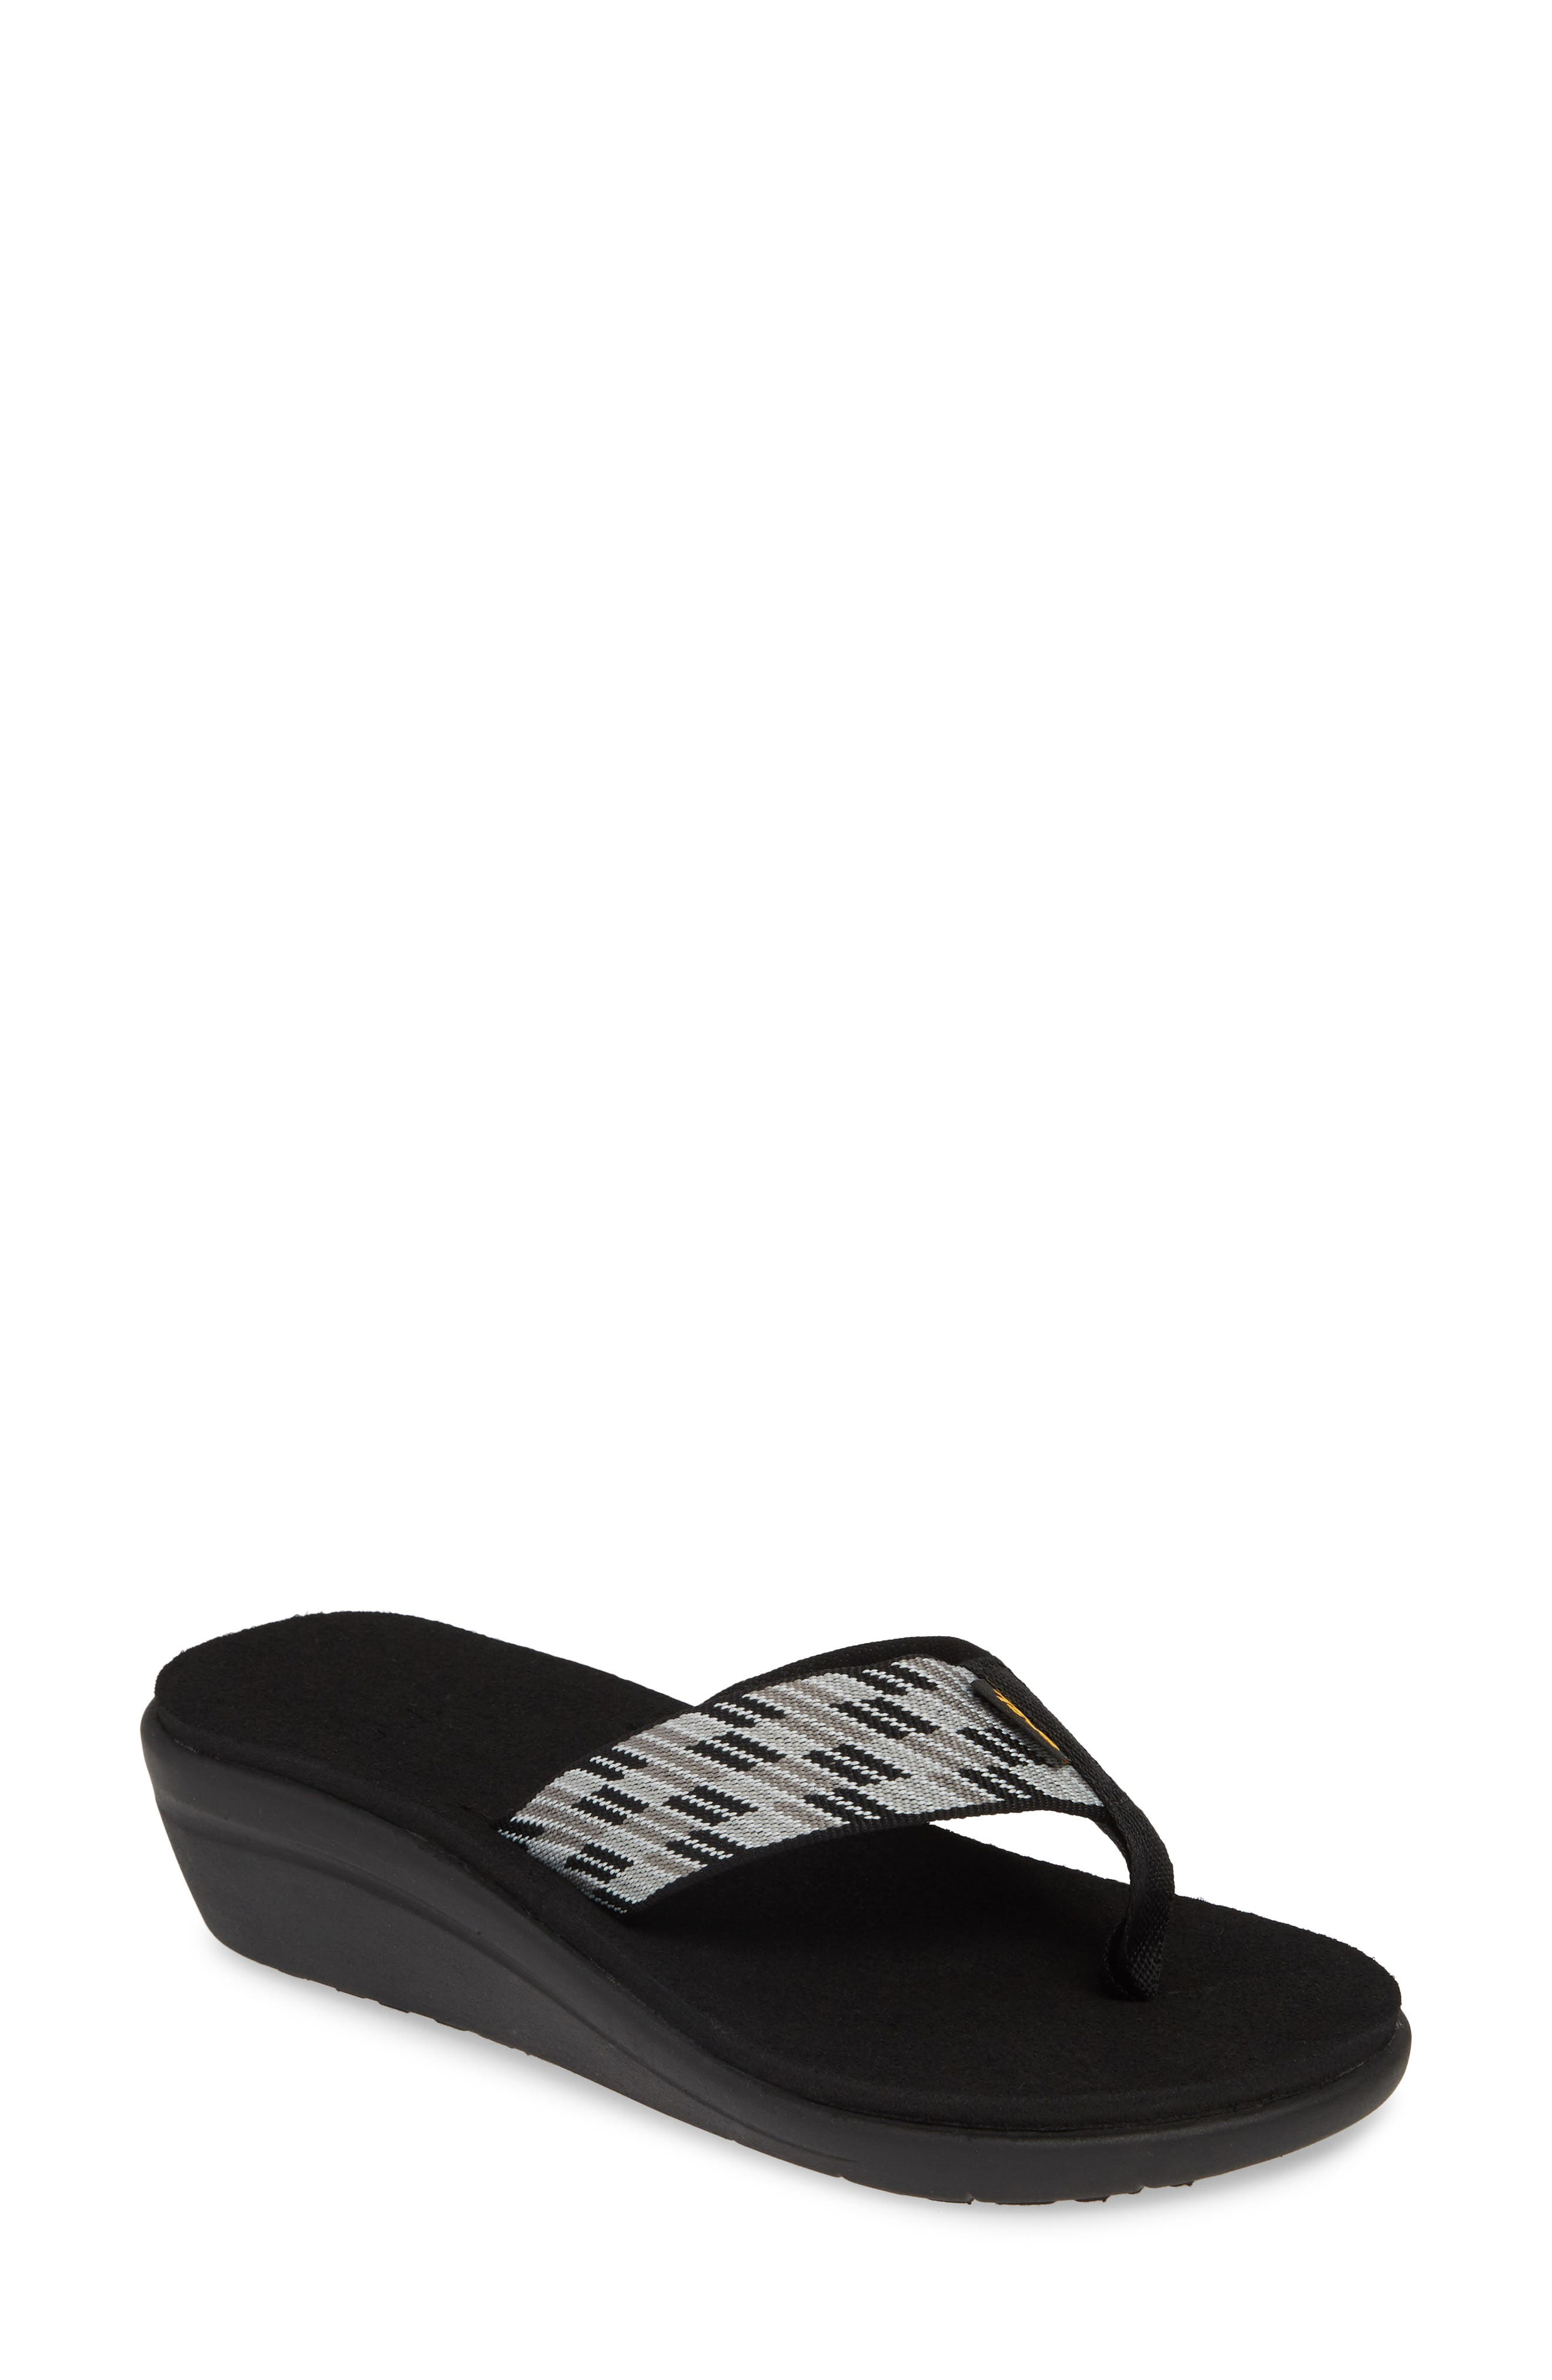 TEVA Voya Wedge Flip Flop, Main, color, BLACK WHITE FABRIC